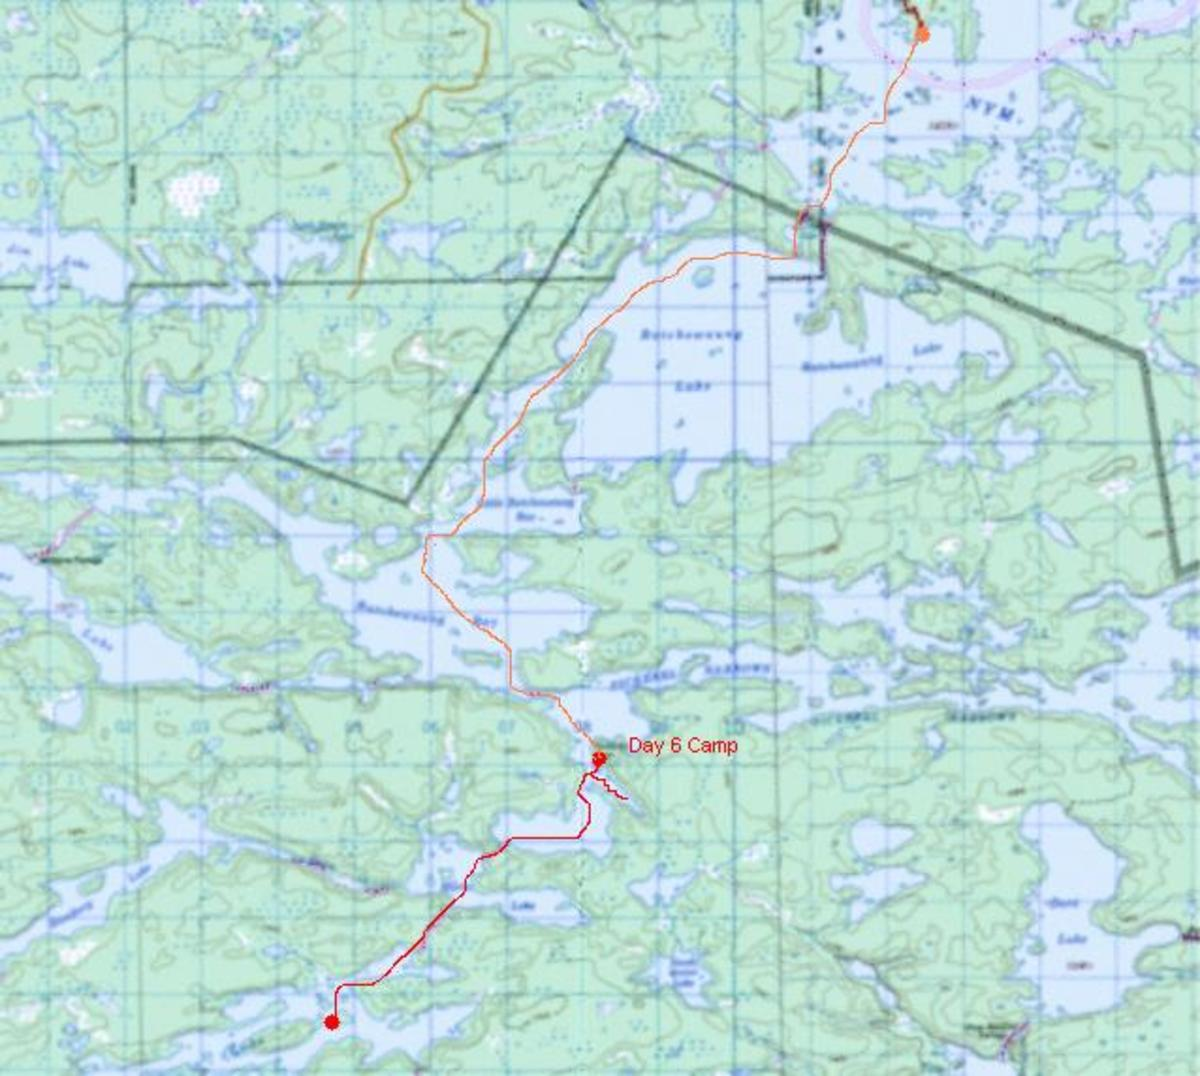 using-my-cedar-strip-canoe-in-canada-2010-trip-day-6-7